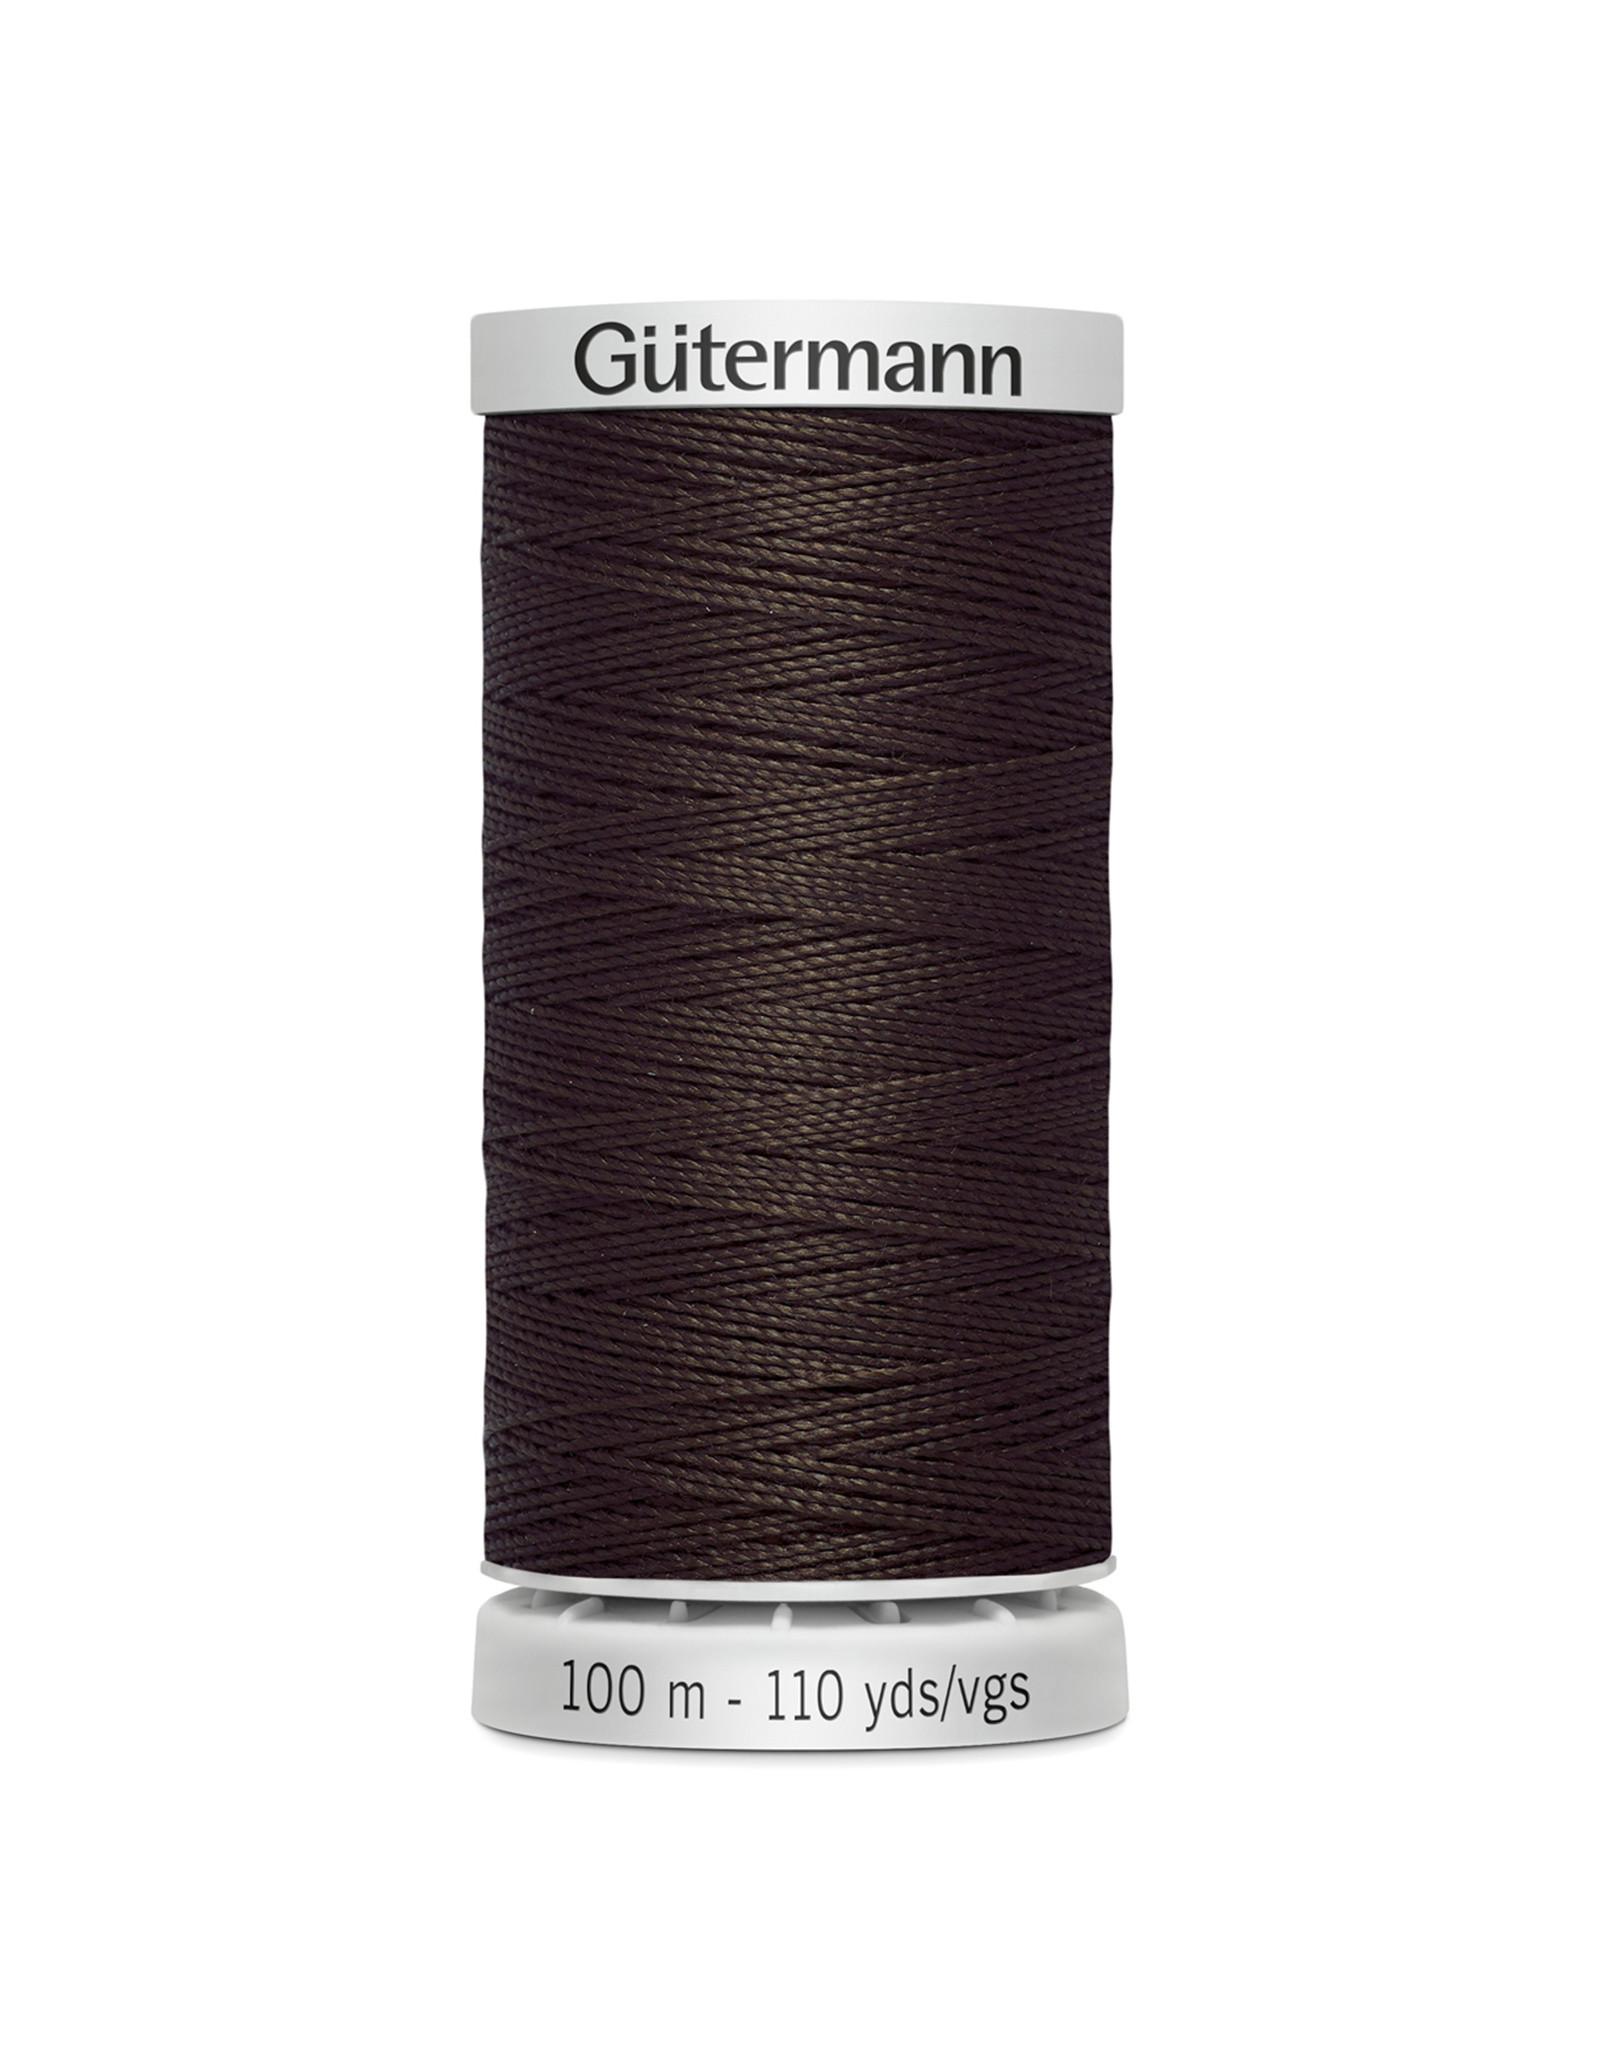 Gütermann Gütermann Super Strong thread 100 m - 696